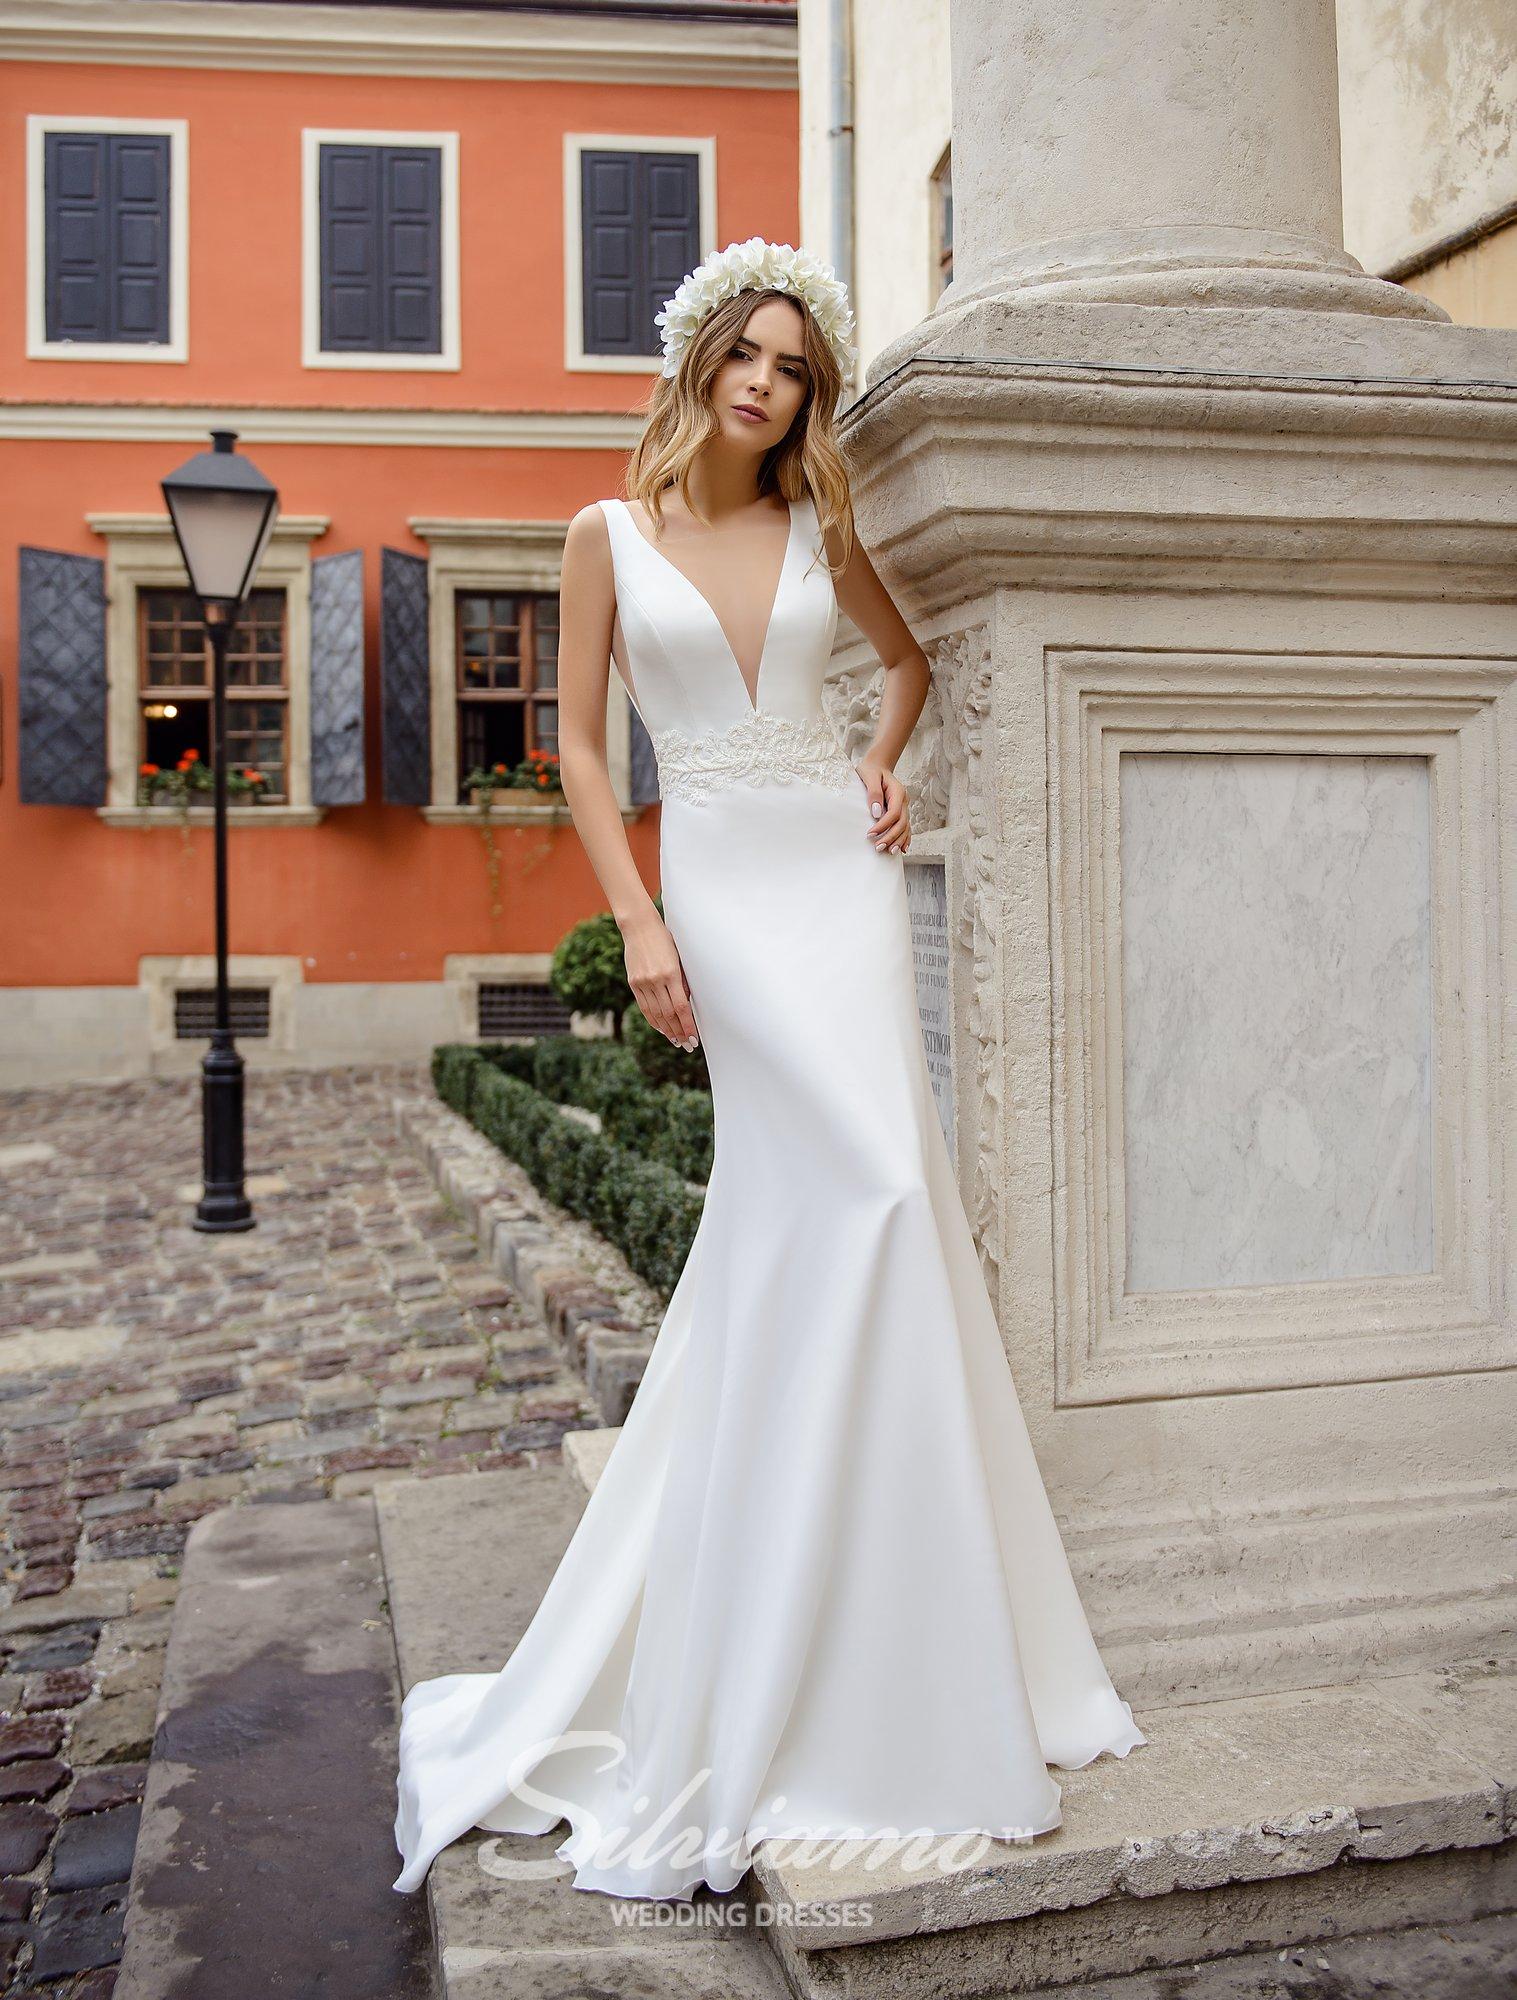 Облягаюча весільна сукня